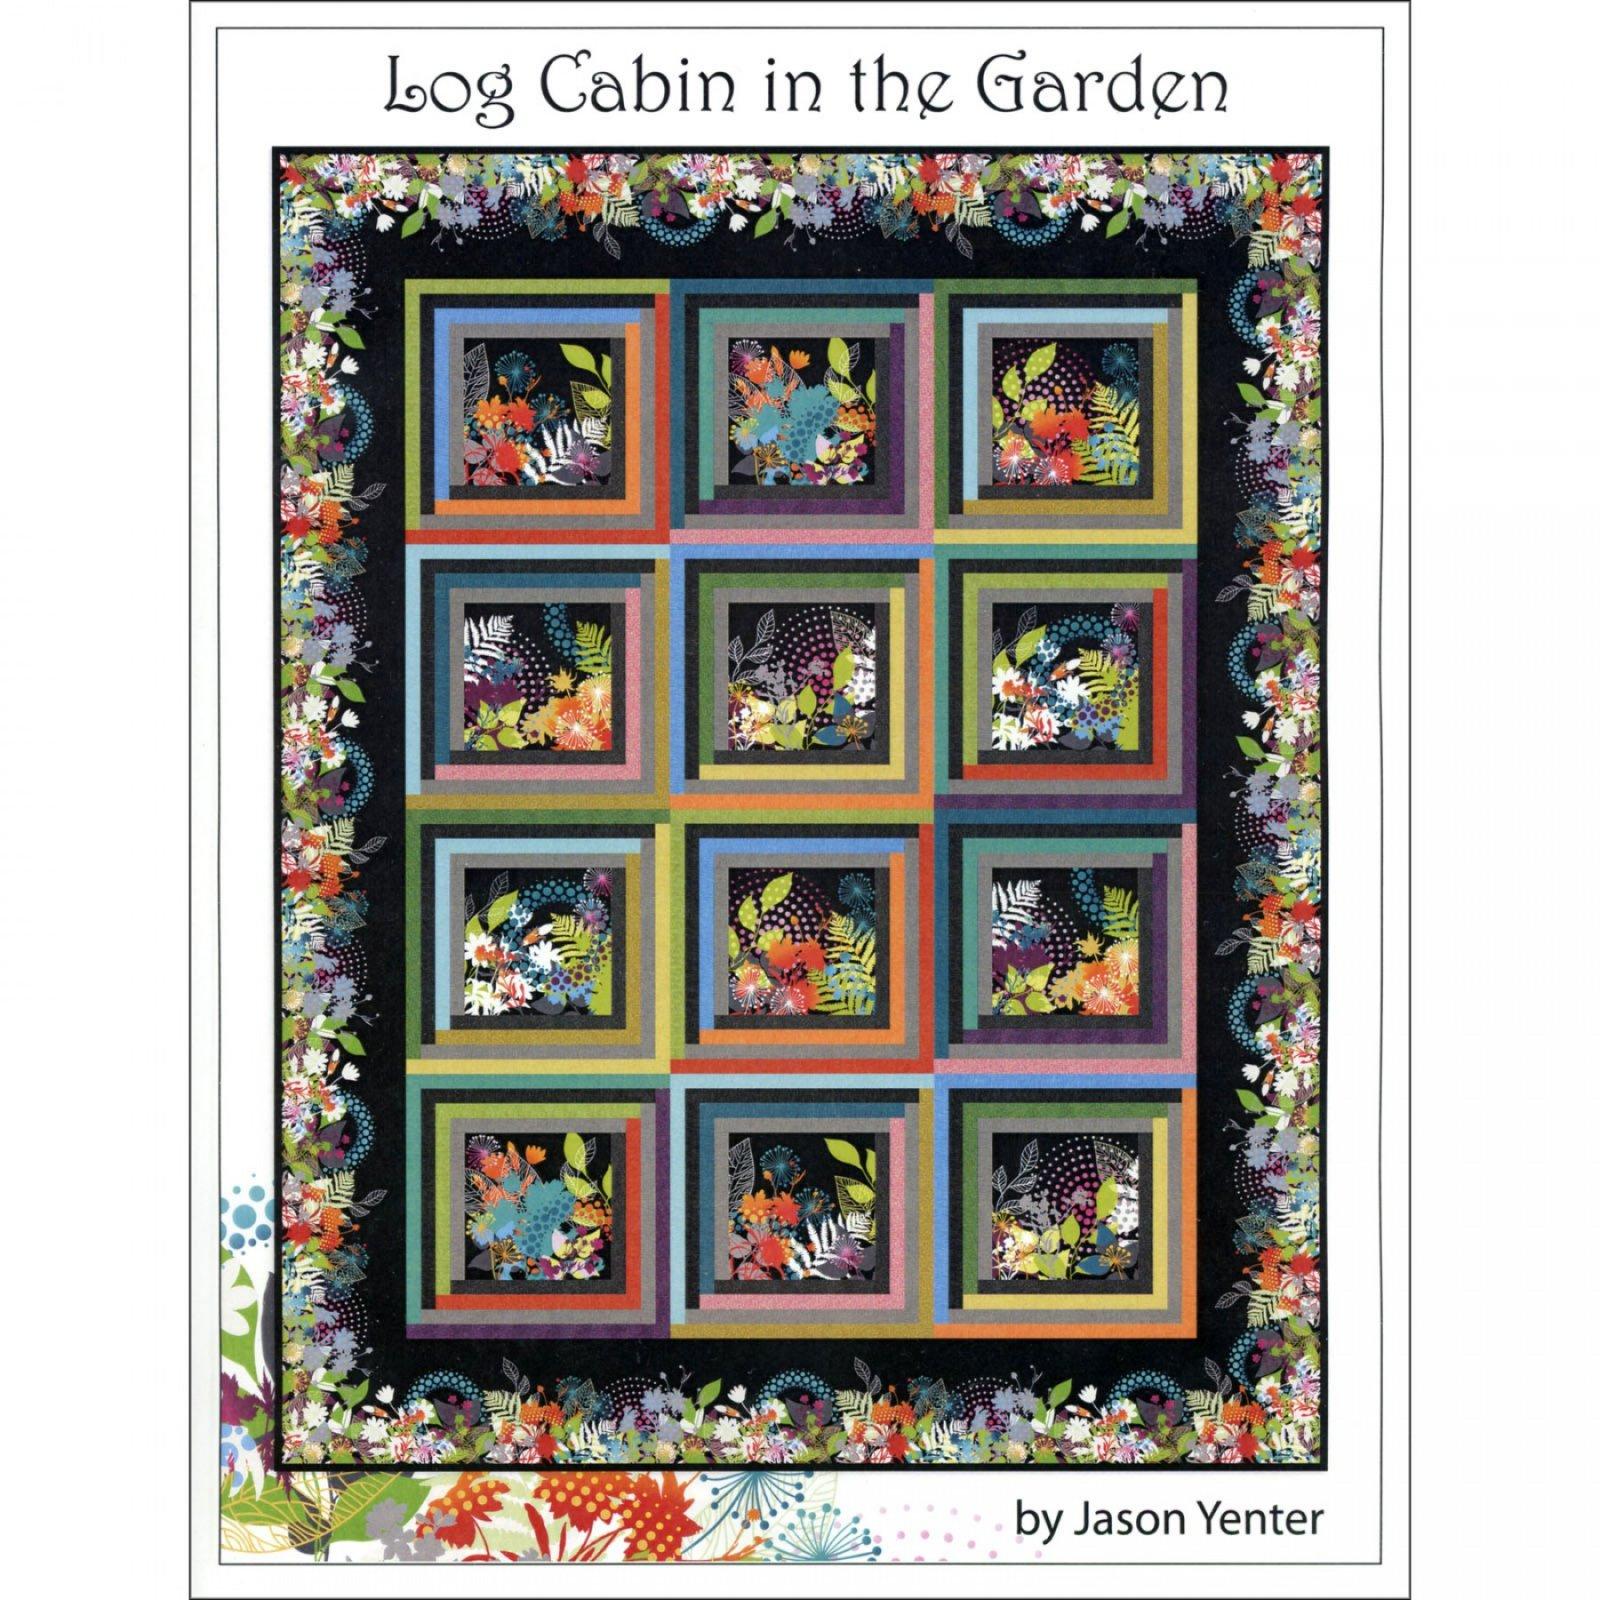 Log Cabin in the Garden - Jason Yenter - ITBUG2P